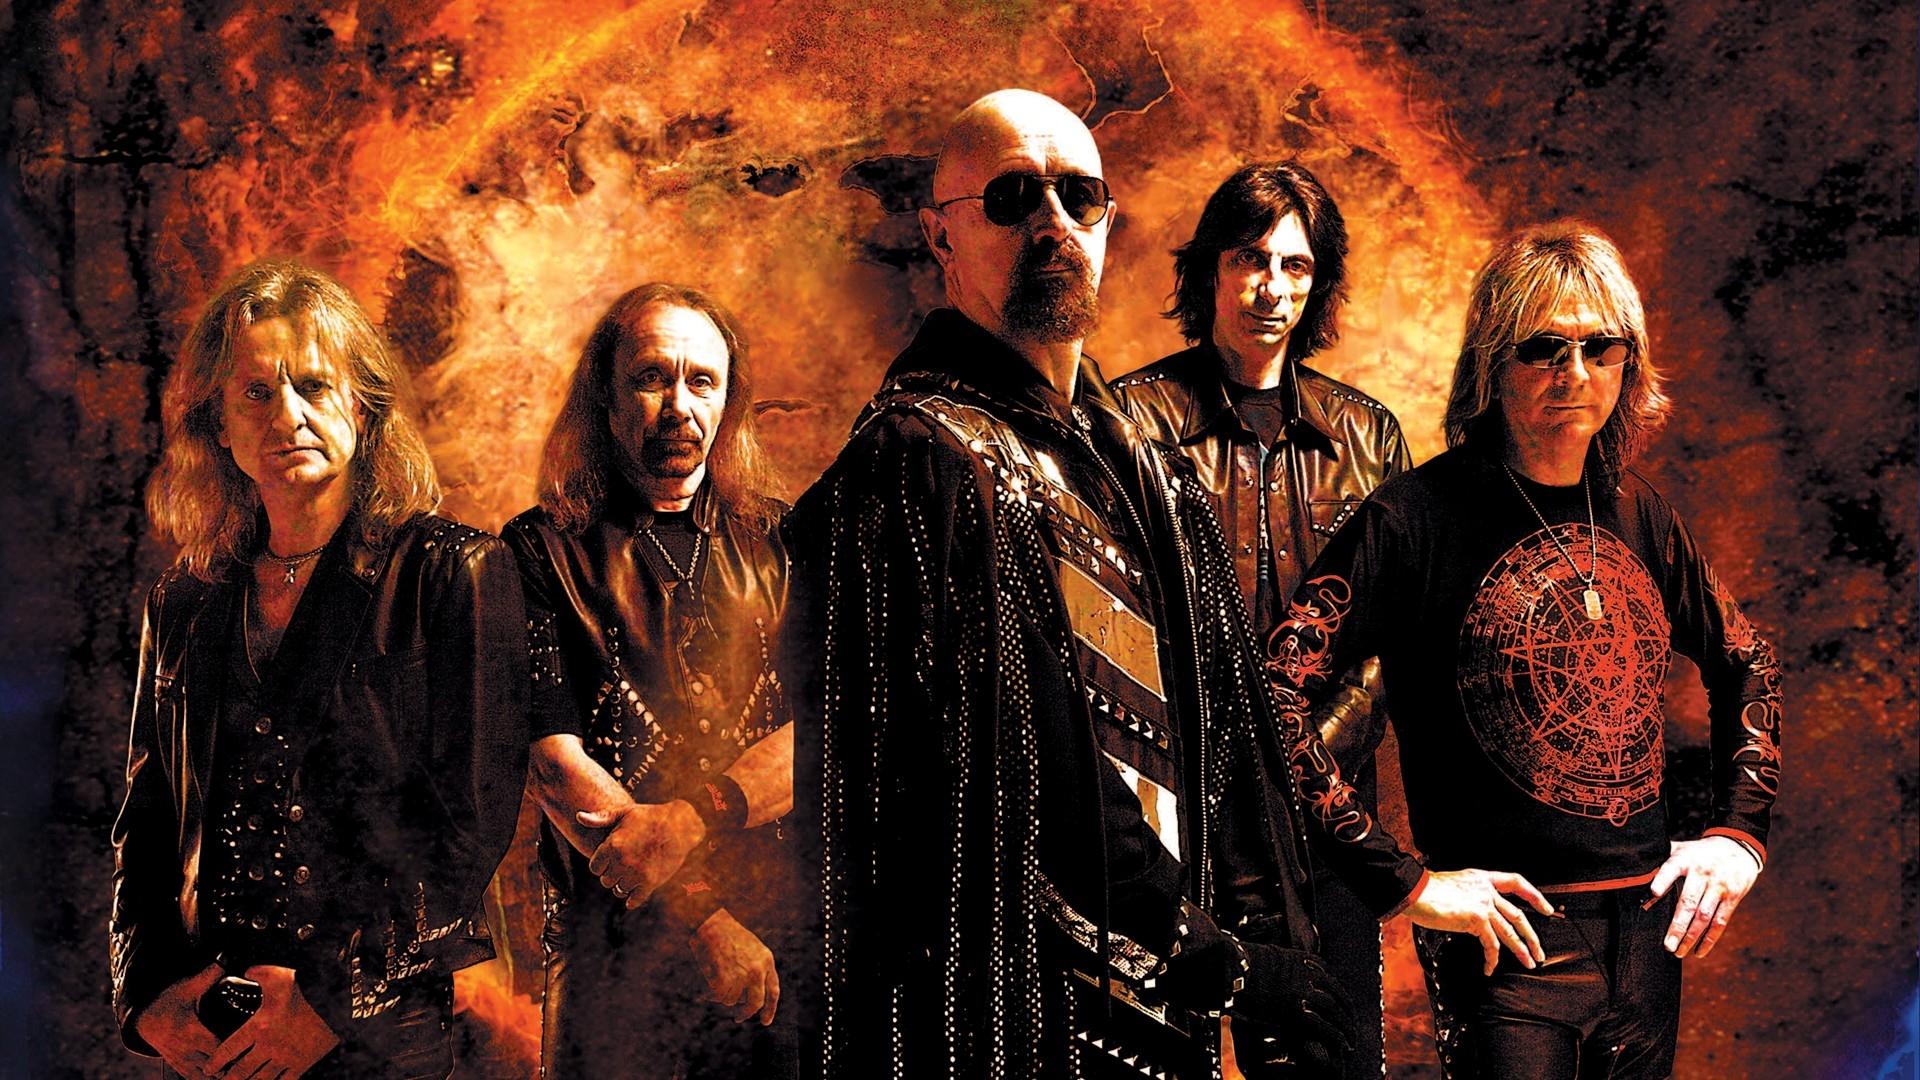 Wallpaper Judas Priest Band Graphics Costumes Print